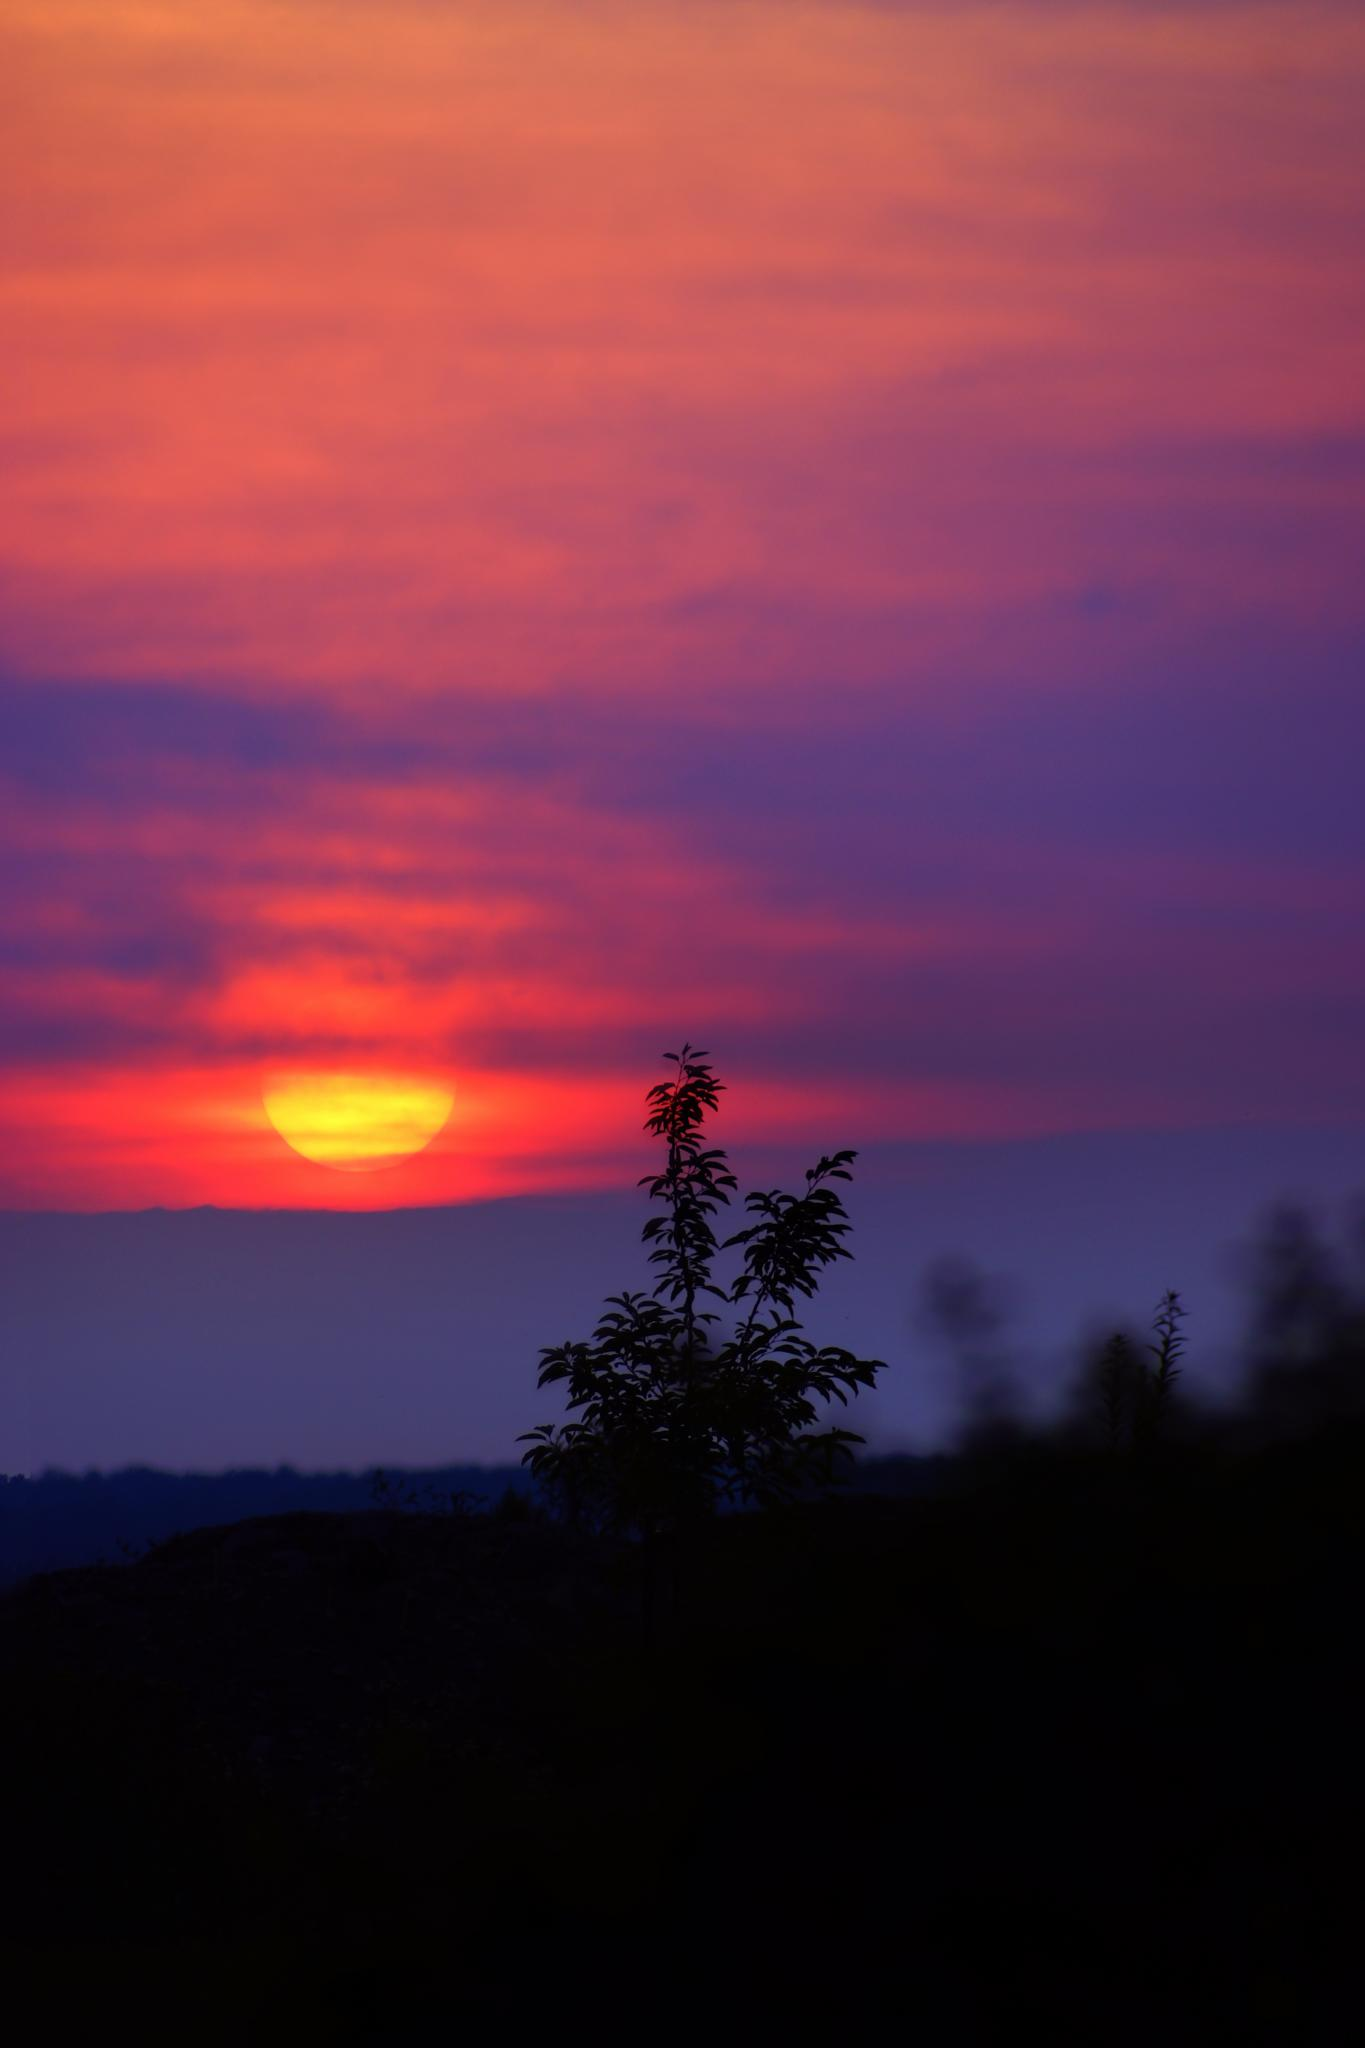 Dramatic sunset by sylviecorriveau